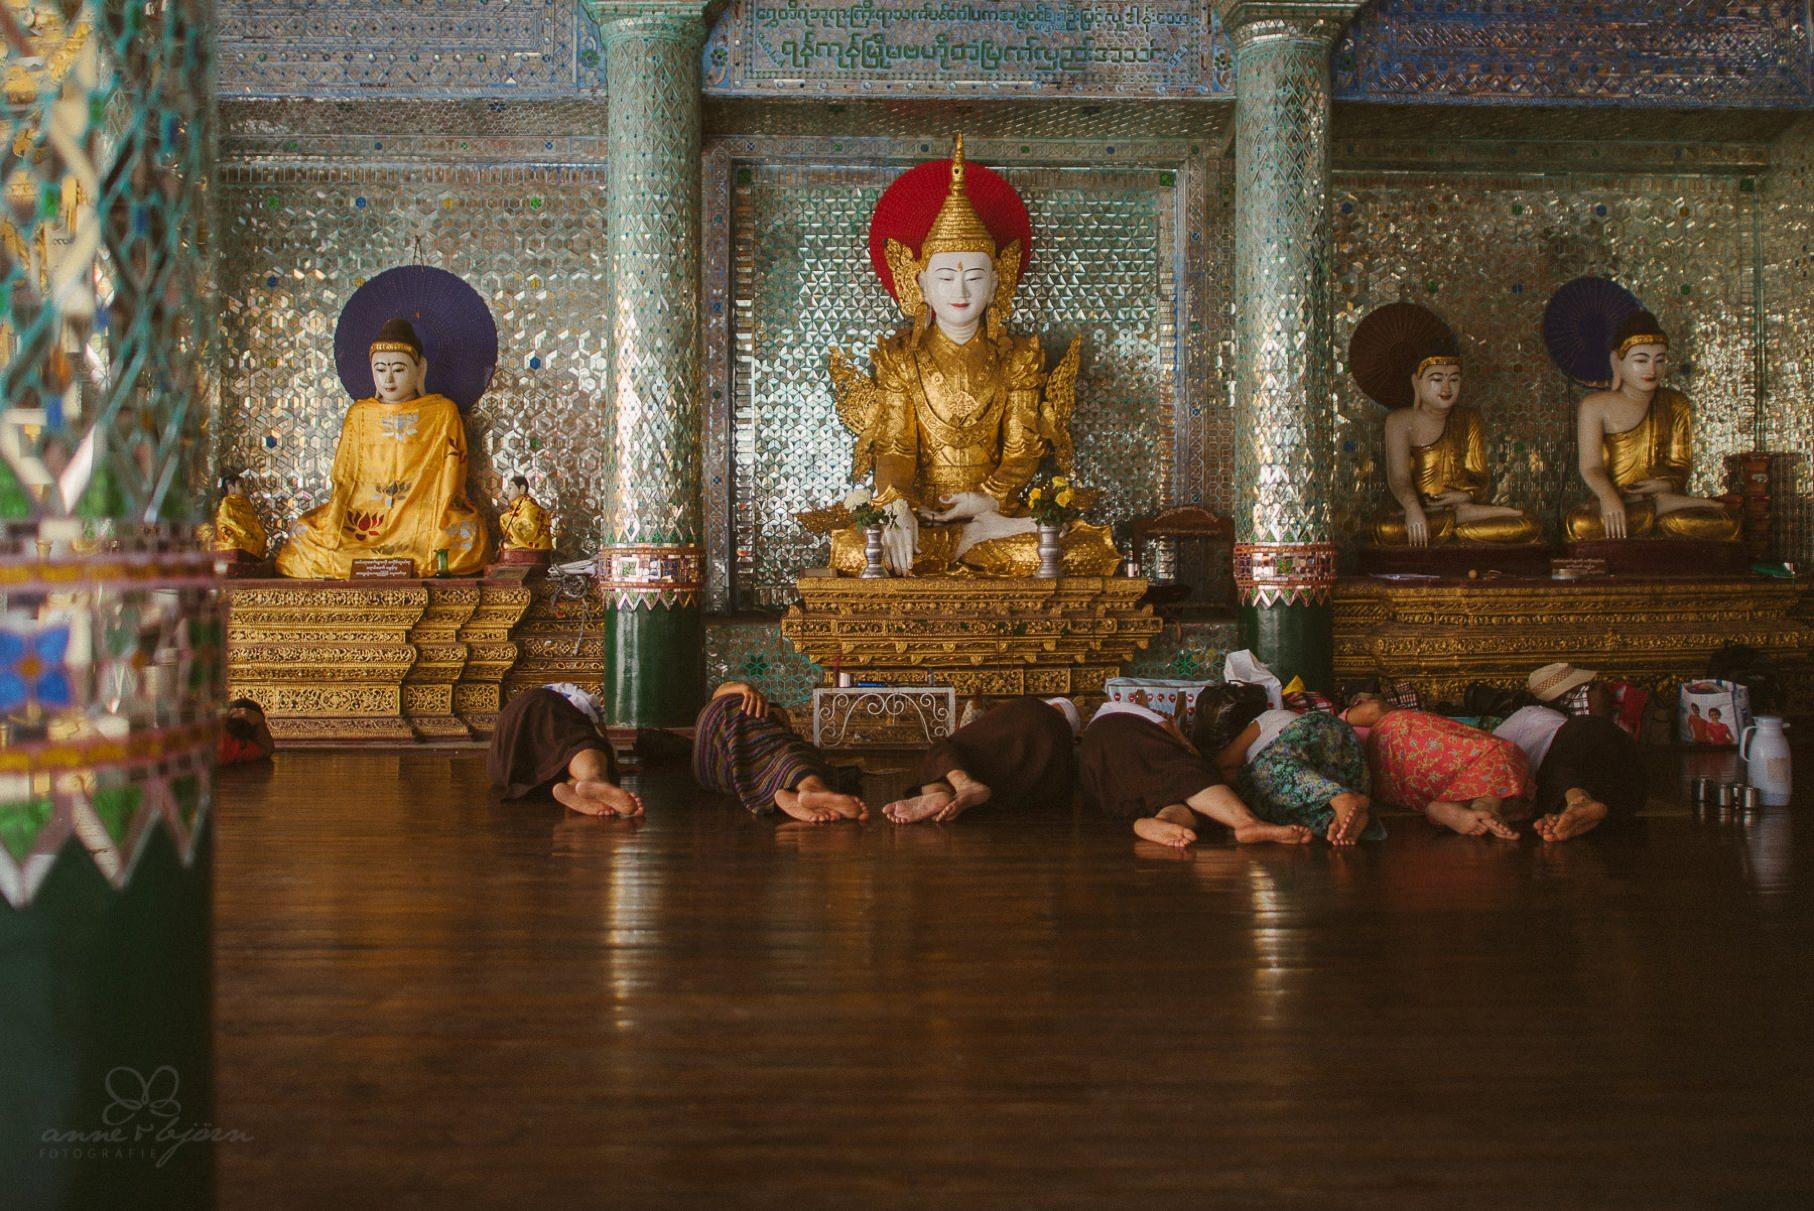 0019 yangon mandalay d76 4389 - Großstädte Myanmars - Yangon & Mandalay